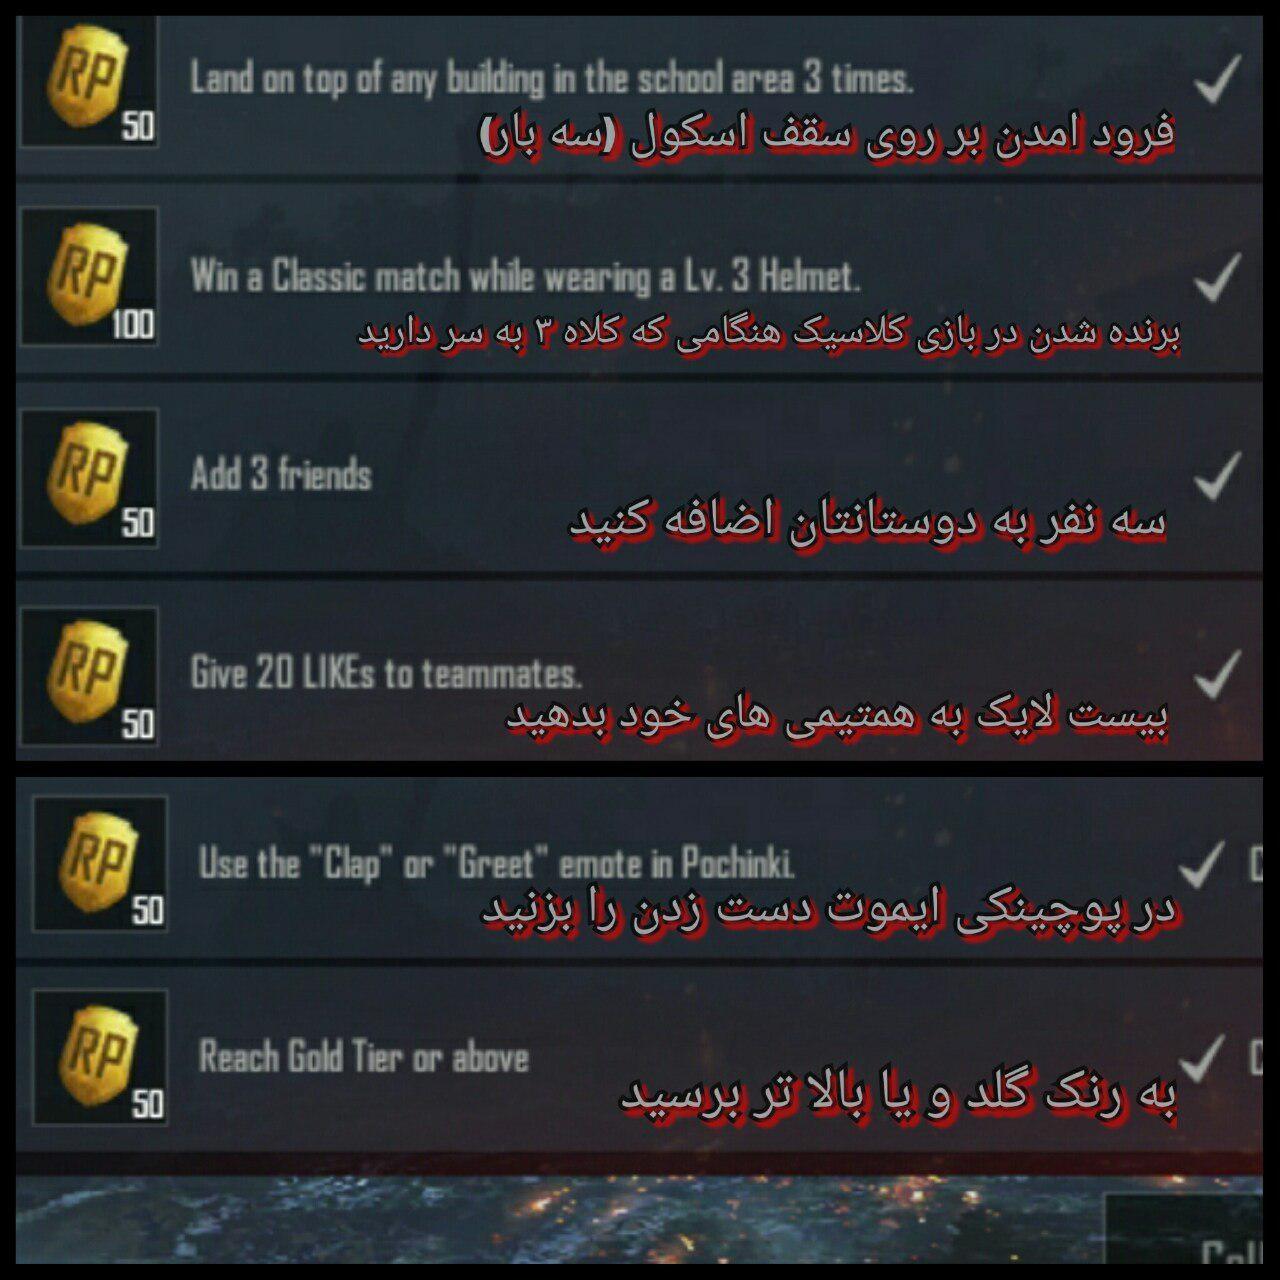 ترجمه ماموریت فصل 9 پابجی موبایل